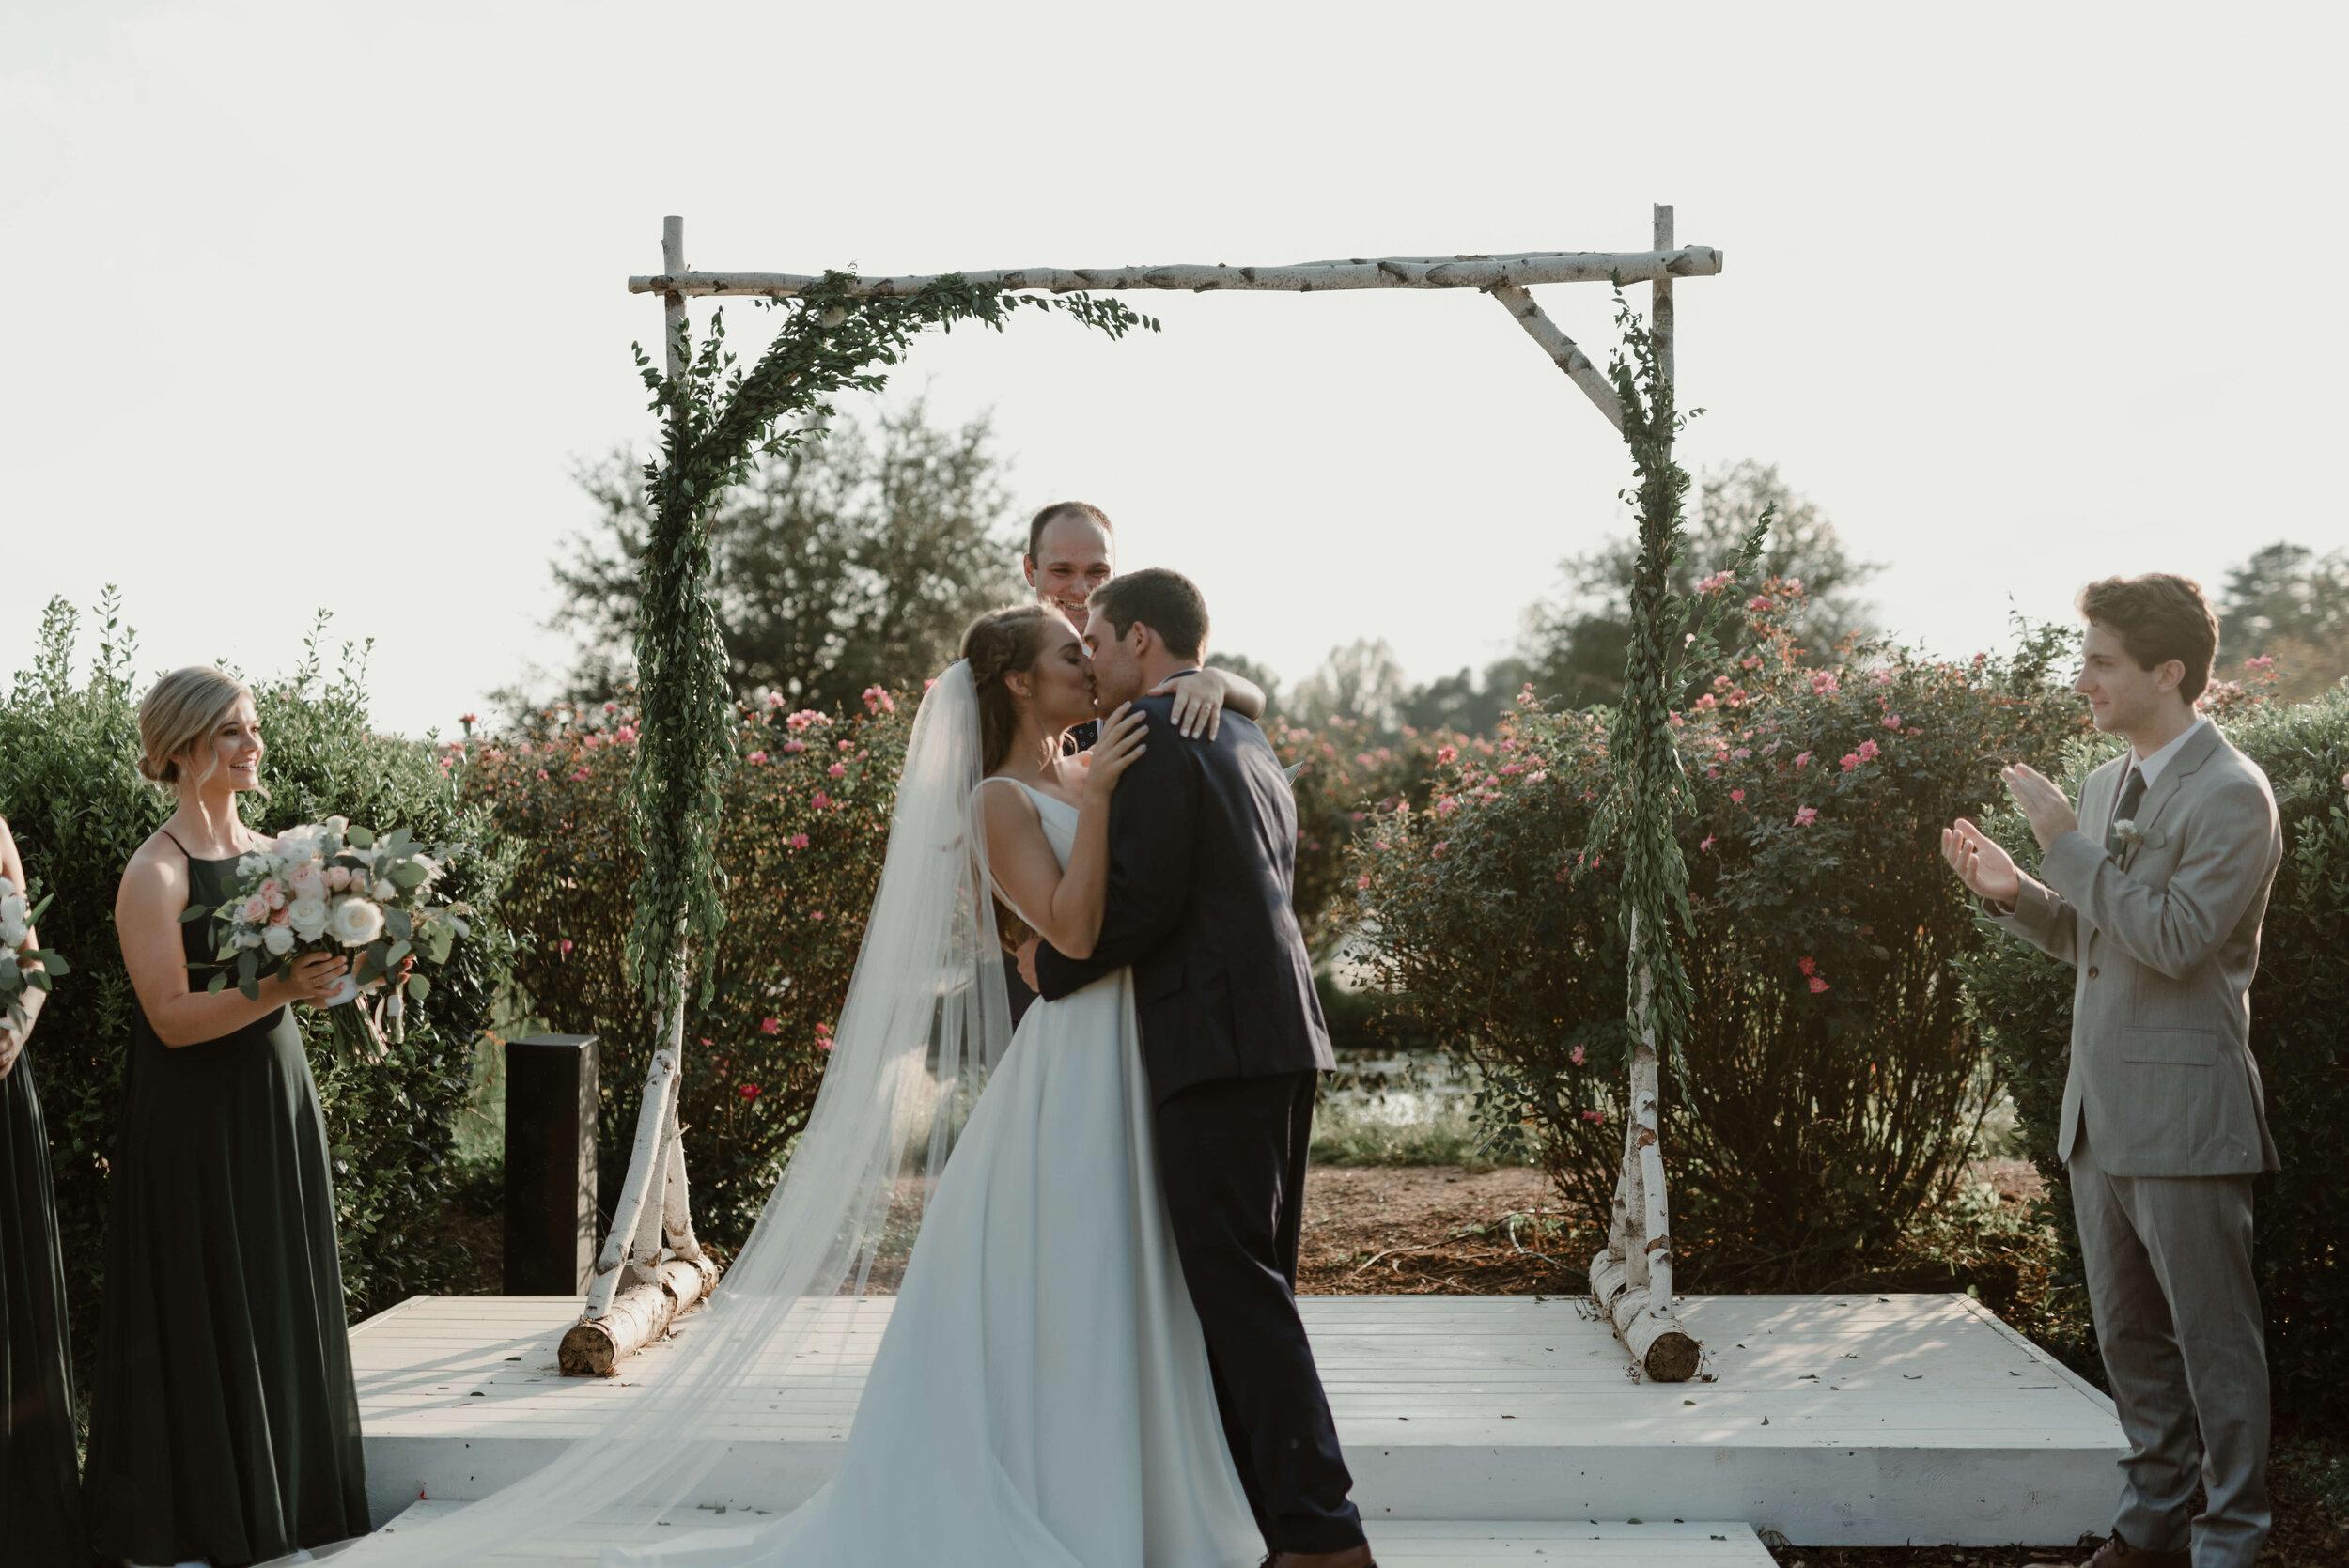 RALEIGH_WEDDING_GABBY_AND_SMITTYDSC_7727.jpg